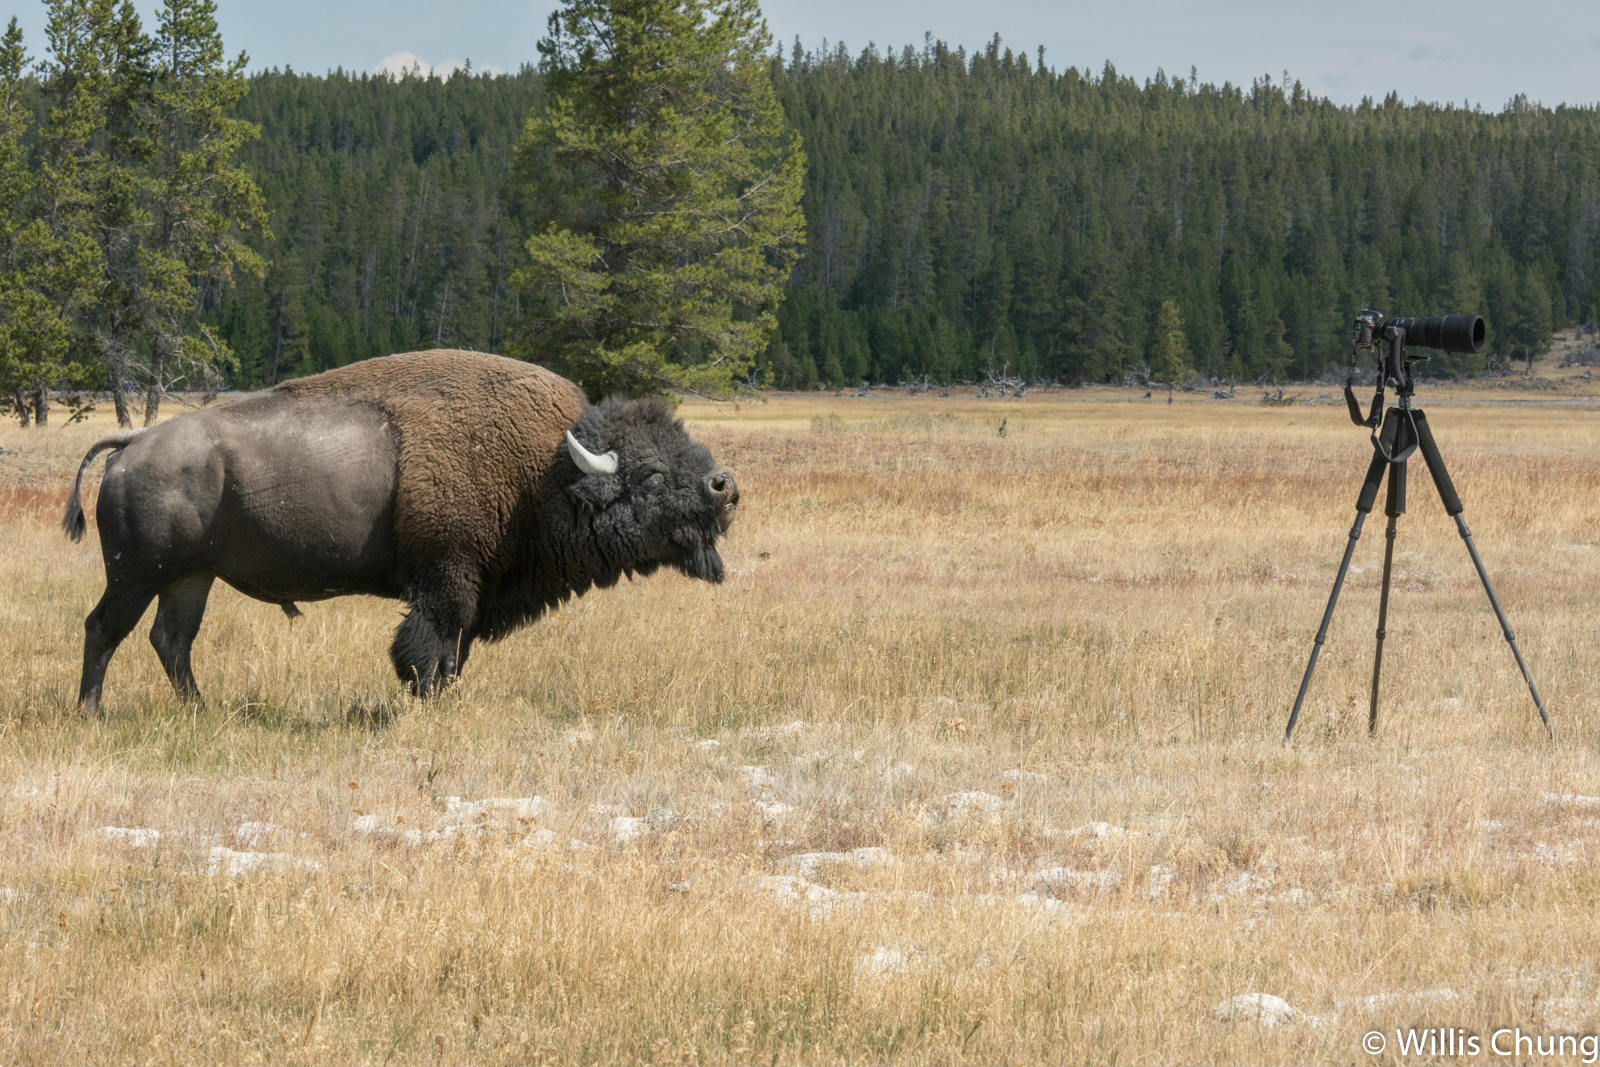 Chung Yellowstone Bull 11 image